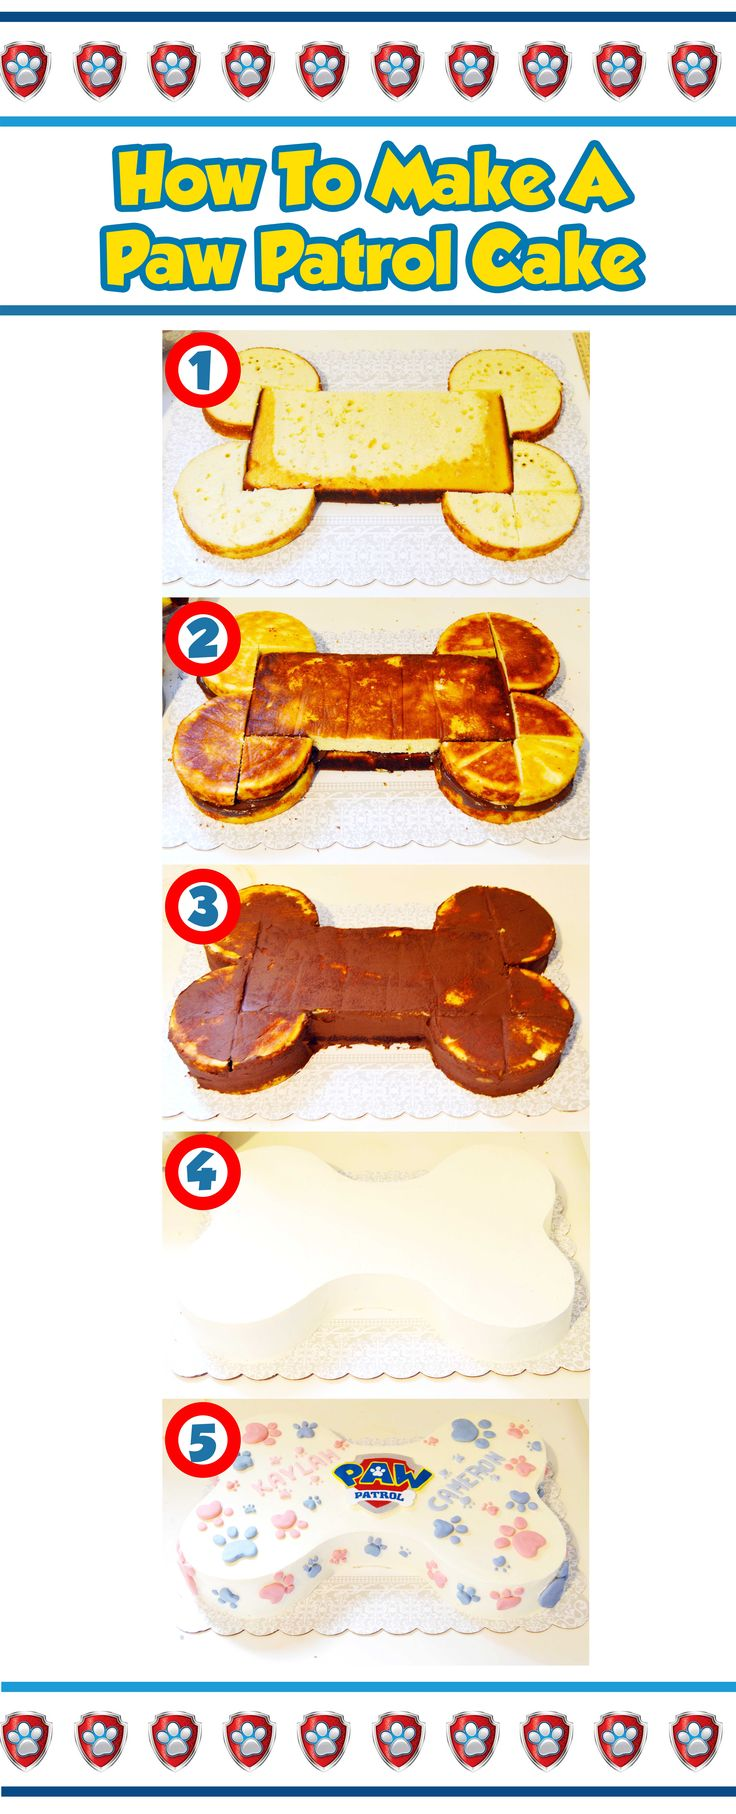 how to make a paw patrol cake                                                                                                                                                                                 More